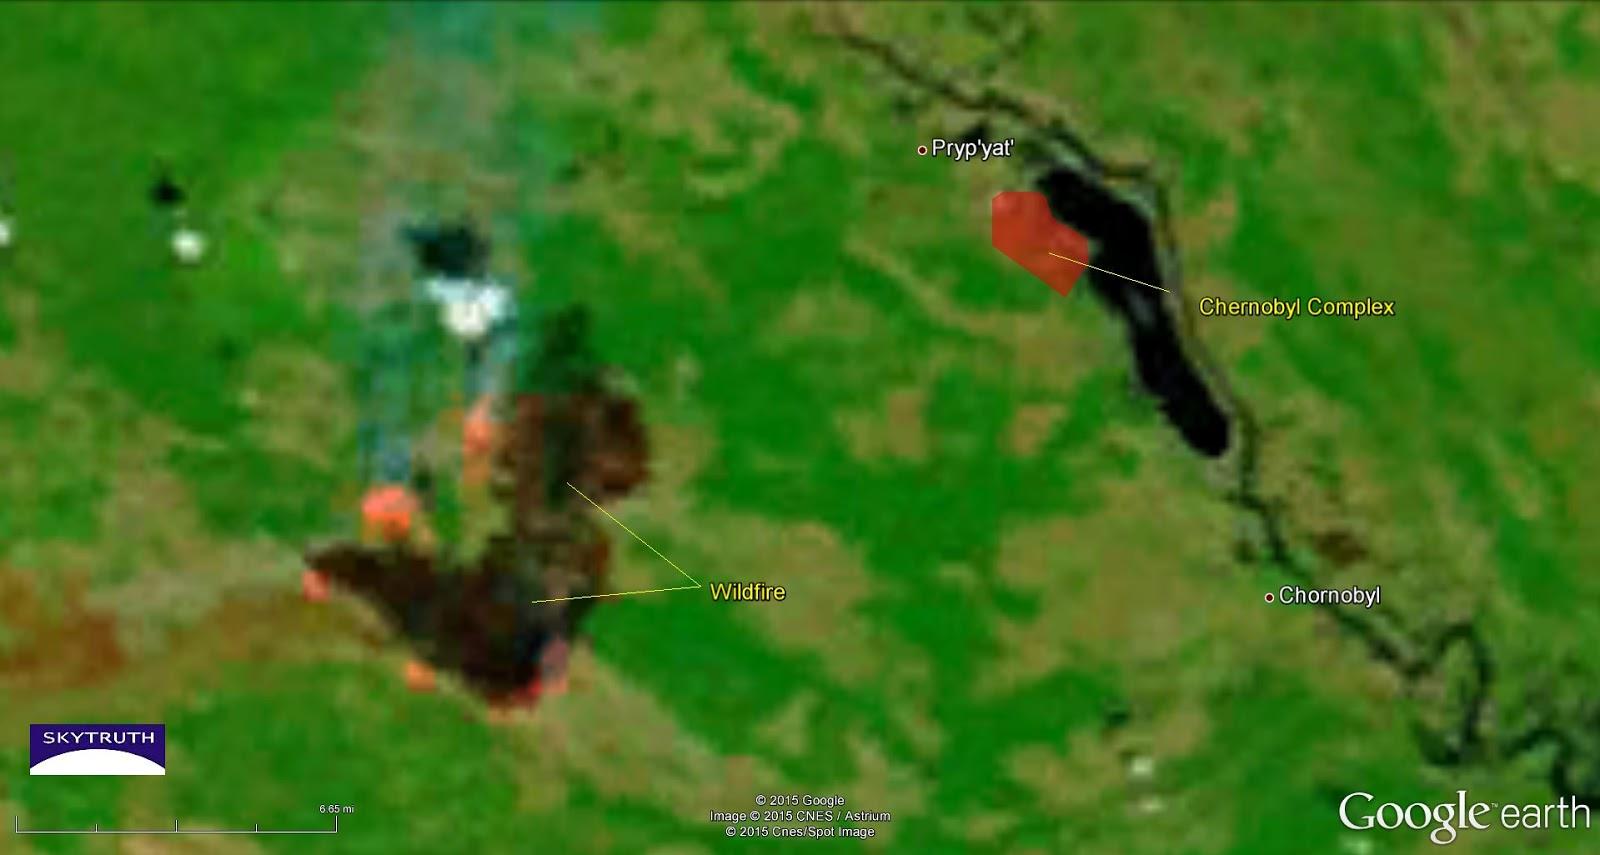 SkyTruth-Chernobyl-wildfire-detail-28april2015-721